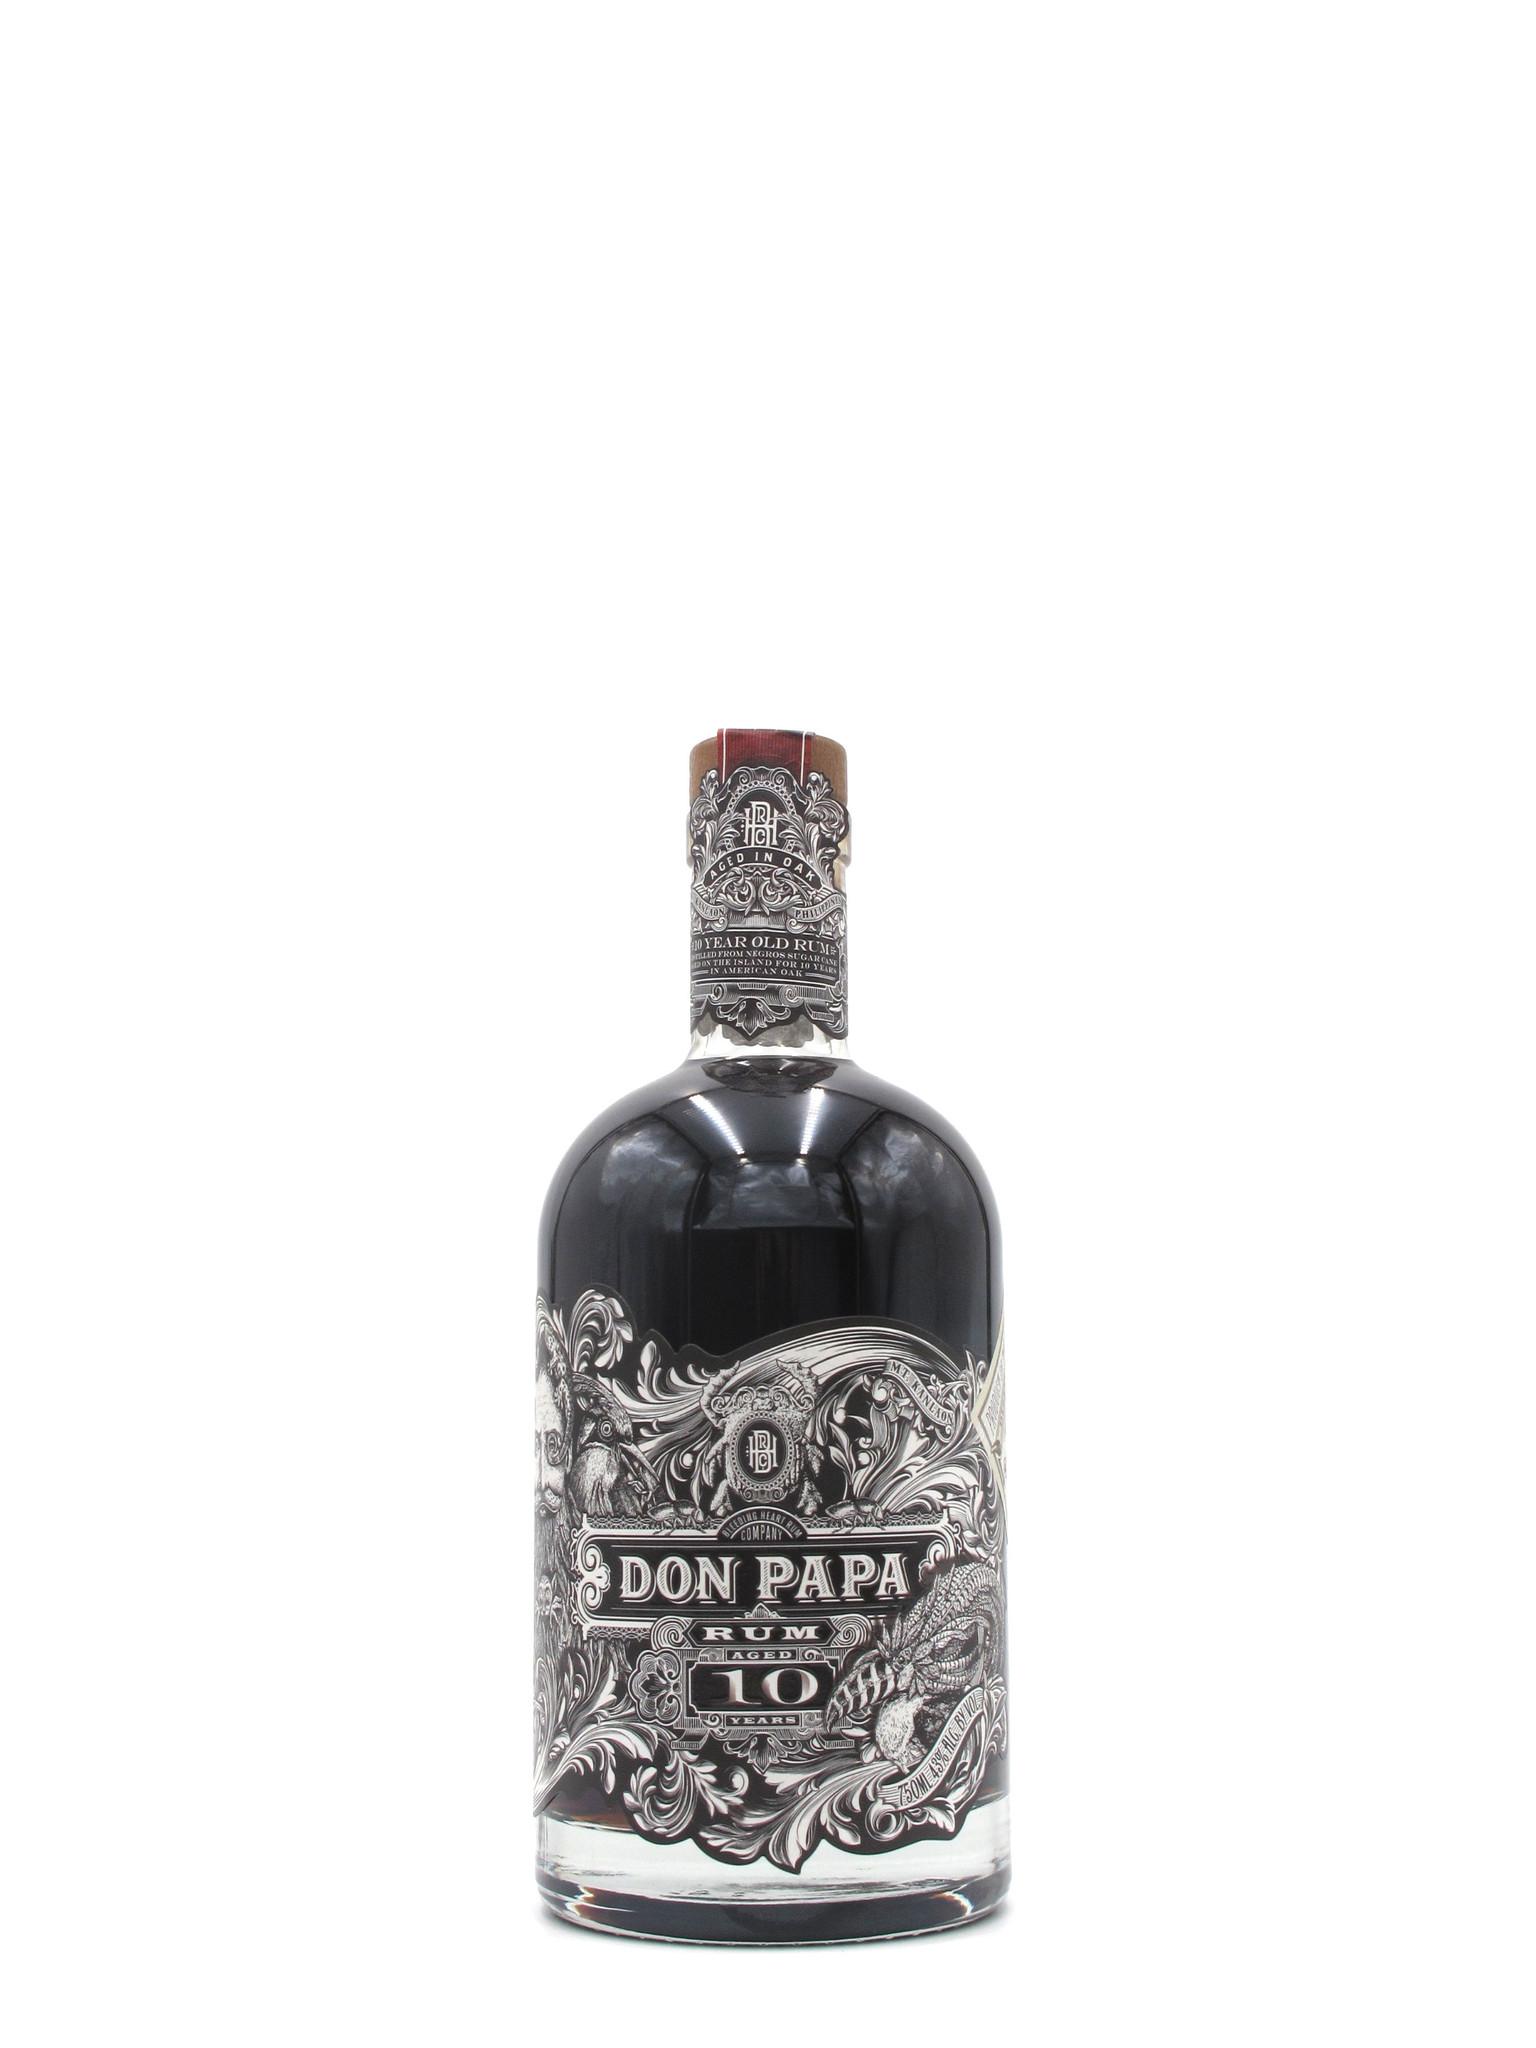 Don Papa Don Papa 10 year Philippines Rum 750ml